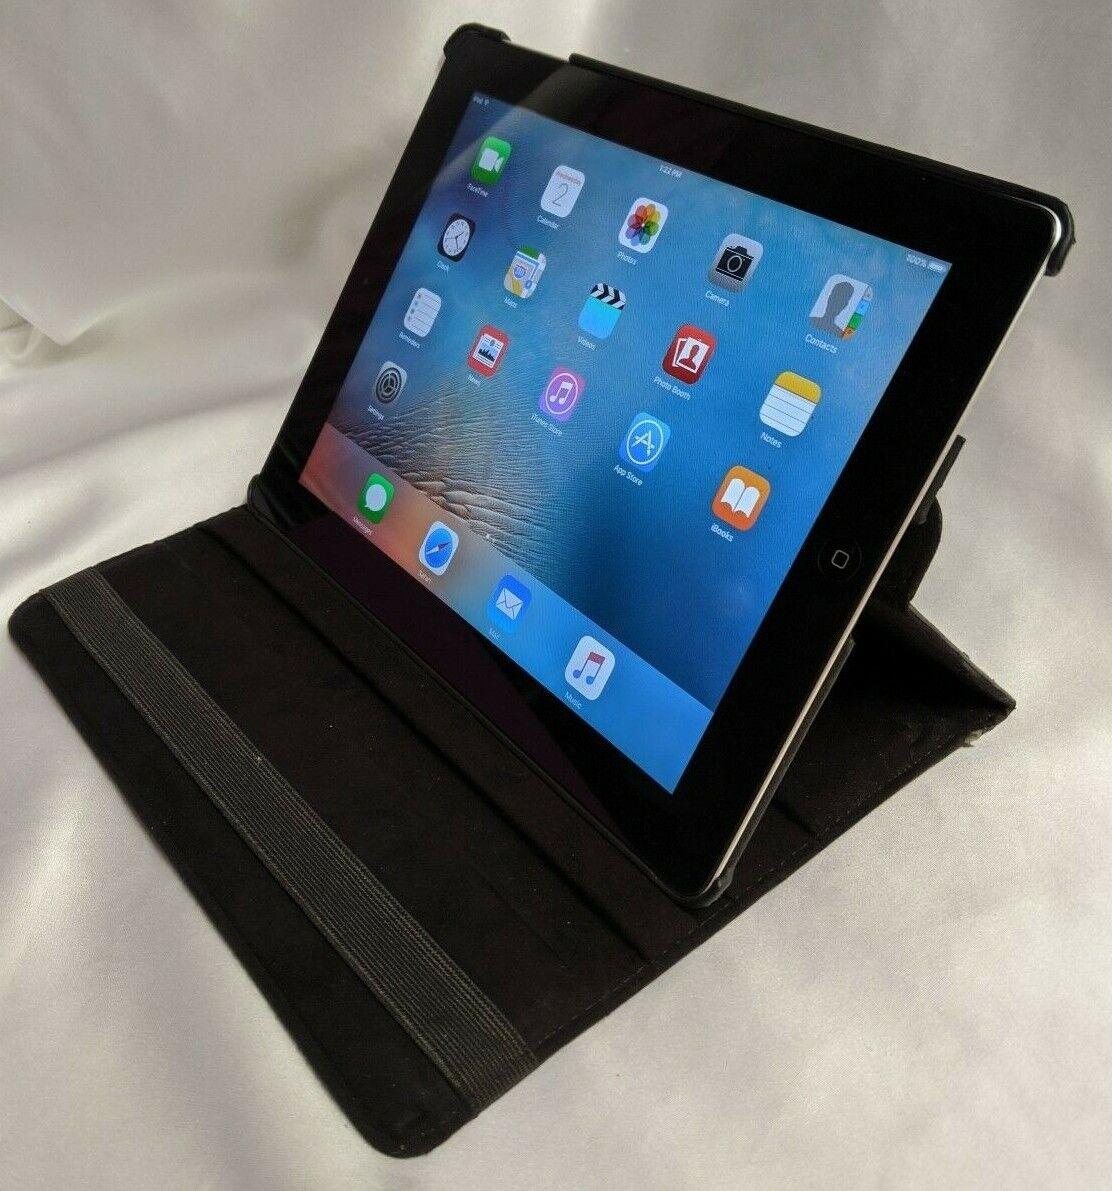 Apple IPad 2nd Gen 16GB Wi-Fi Only WORKING - $39.00